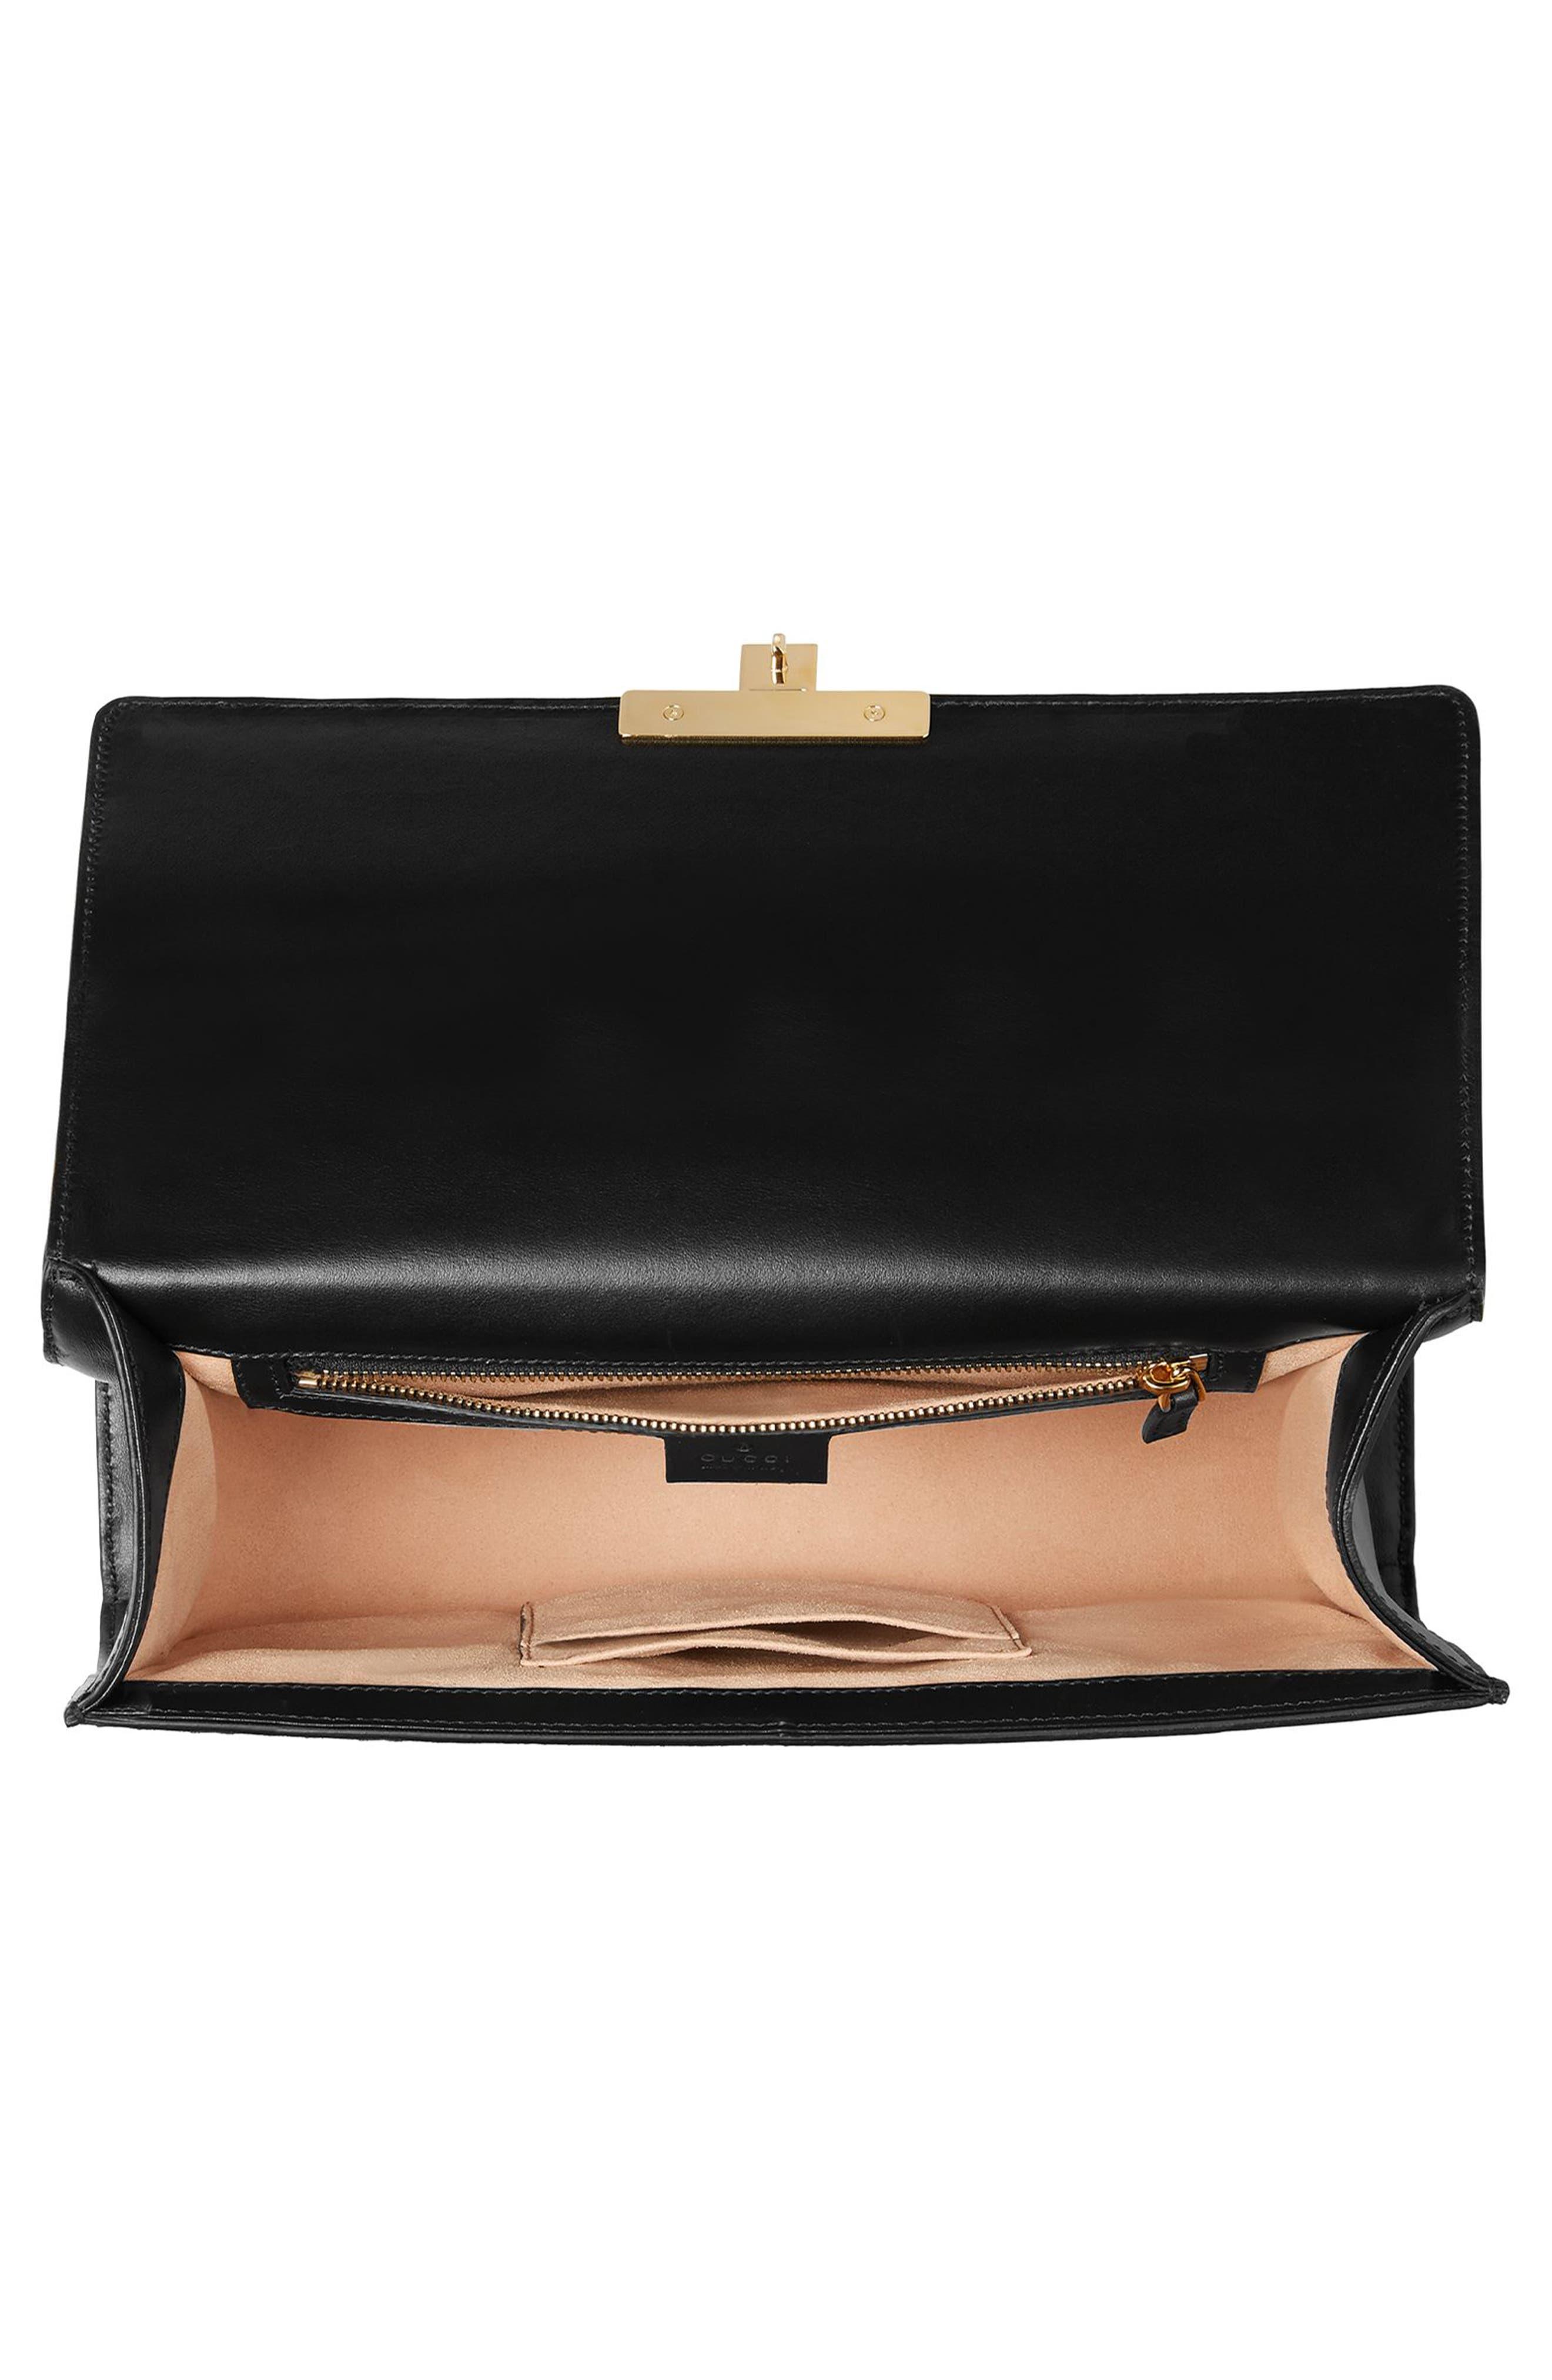 Medium Padlock GG Supreme Canvas & Leather Shoulder Bag,                             Alternate thumbnail 3, color,                             NERO/ORO VECCHIO